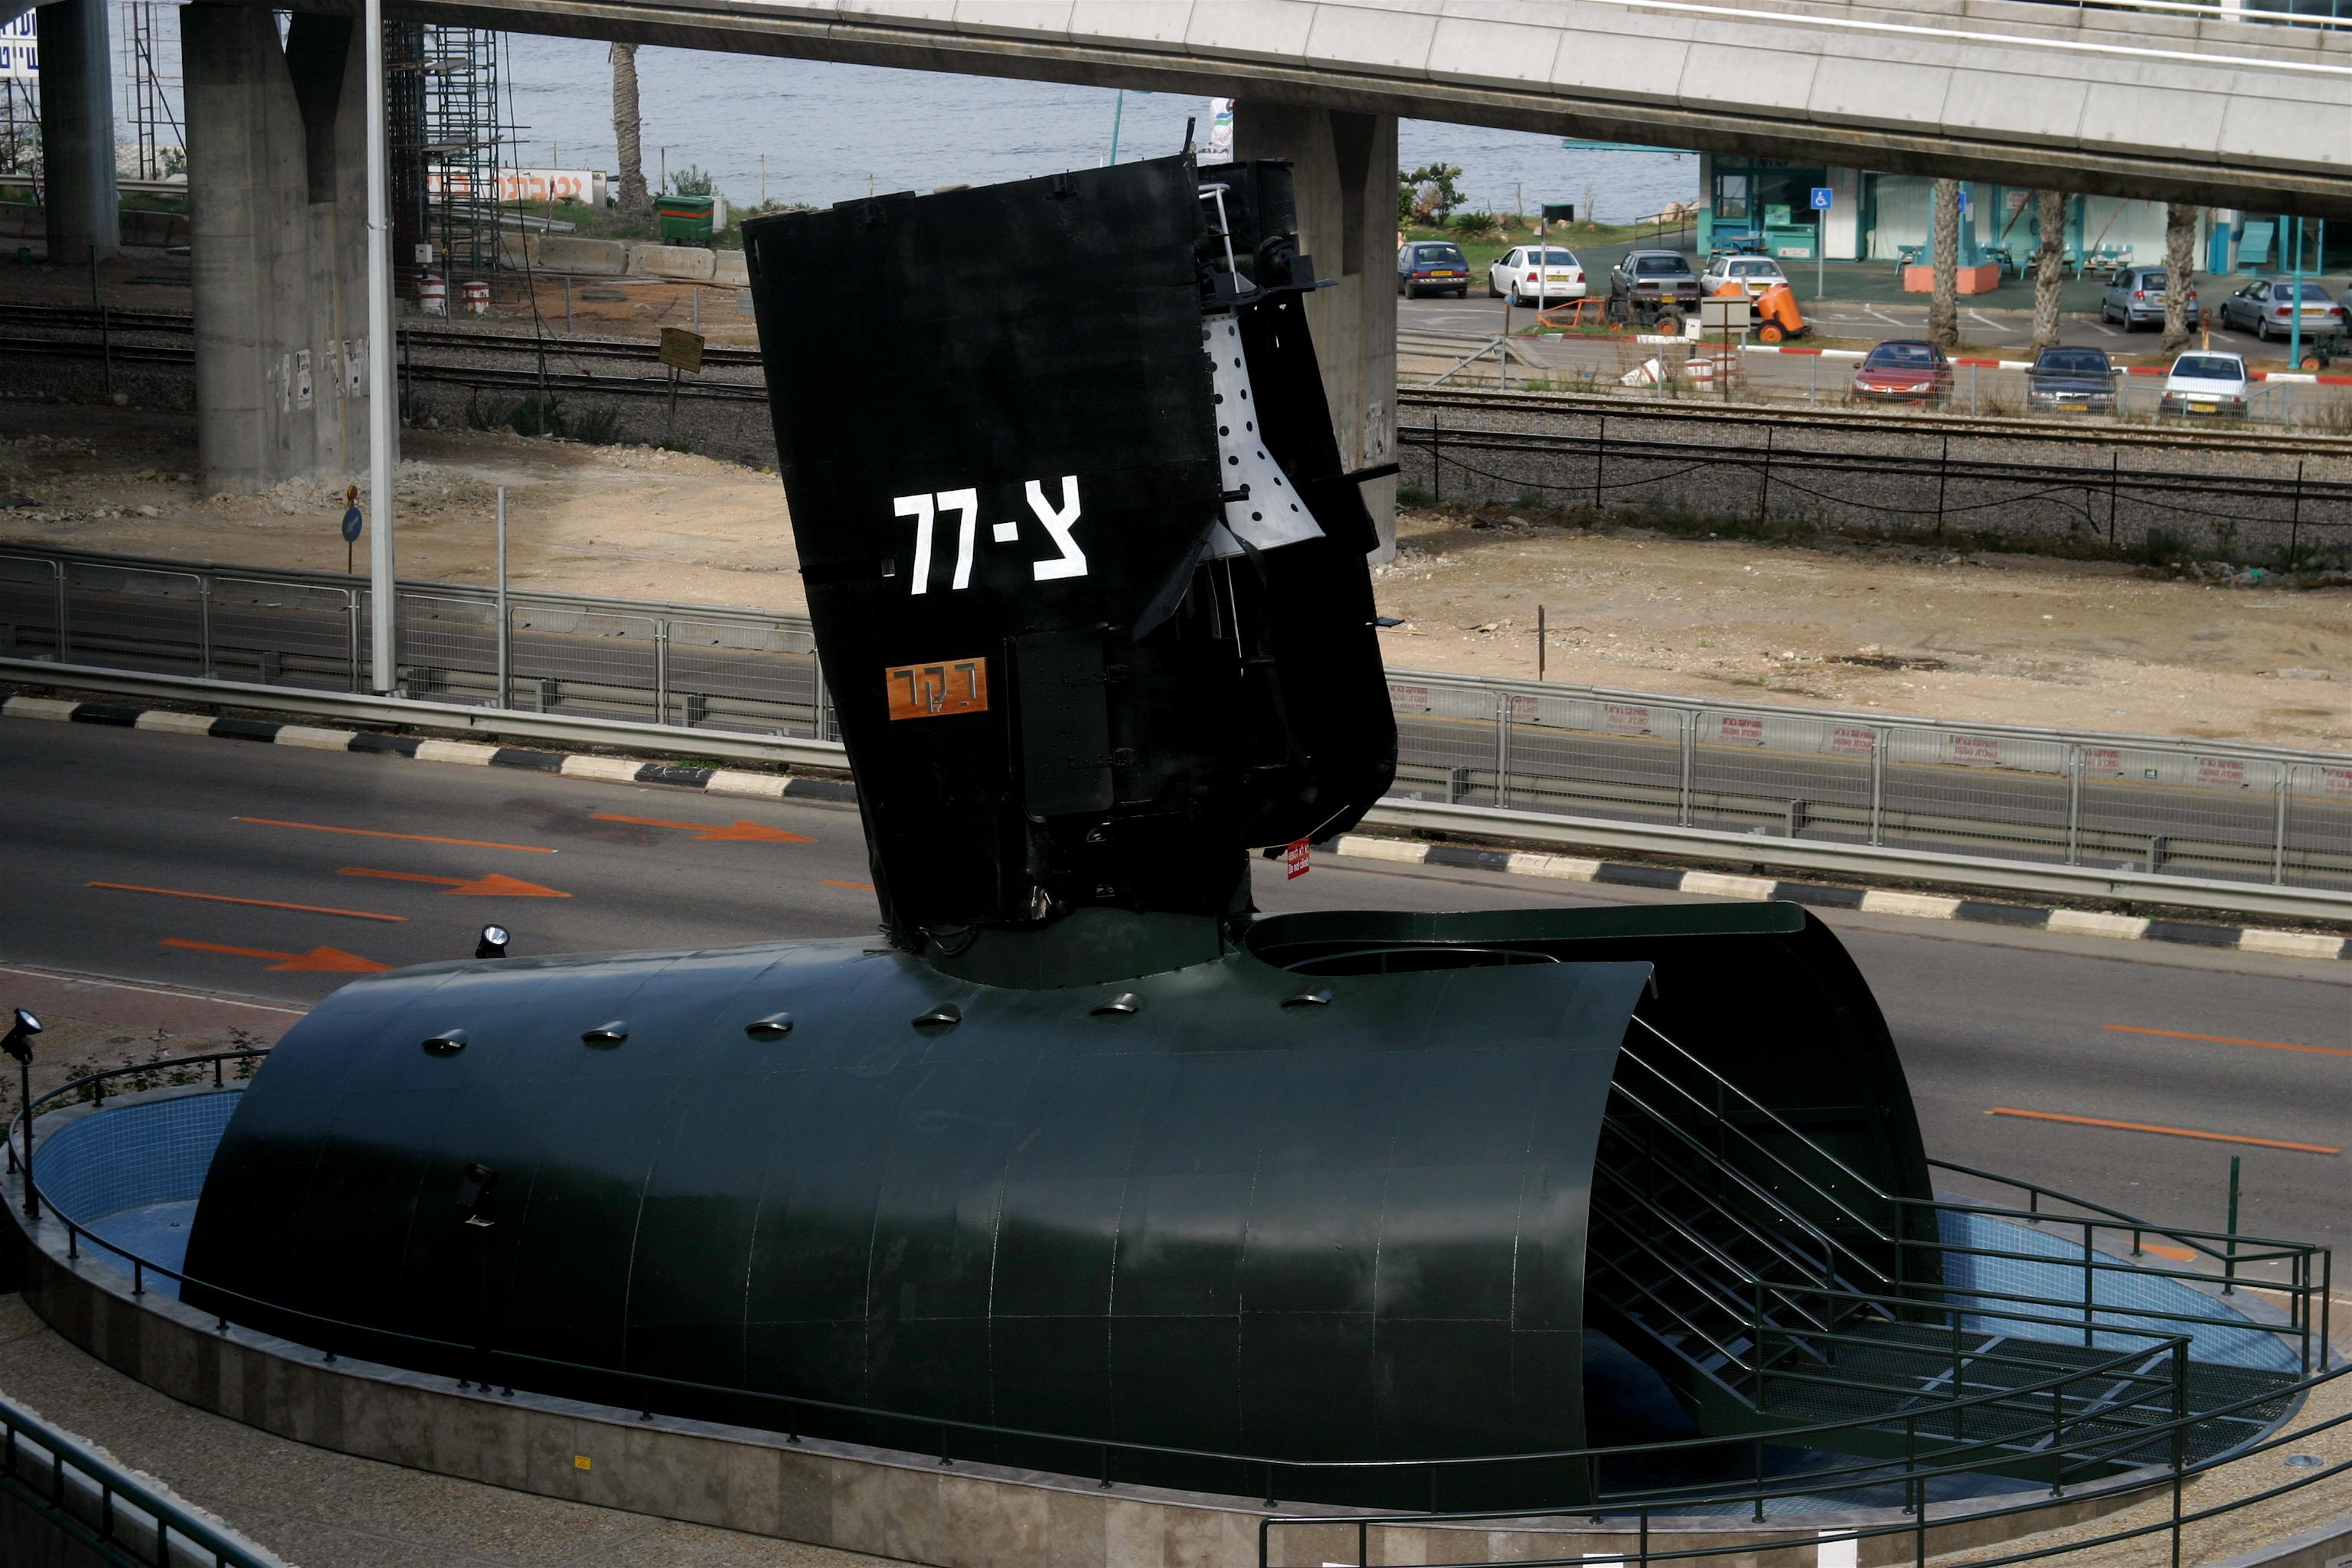 INS Dakar submarine bridge memorial